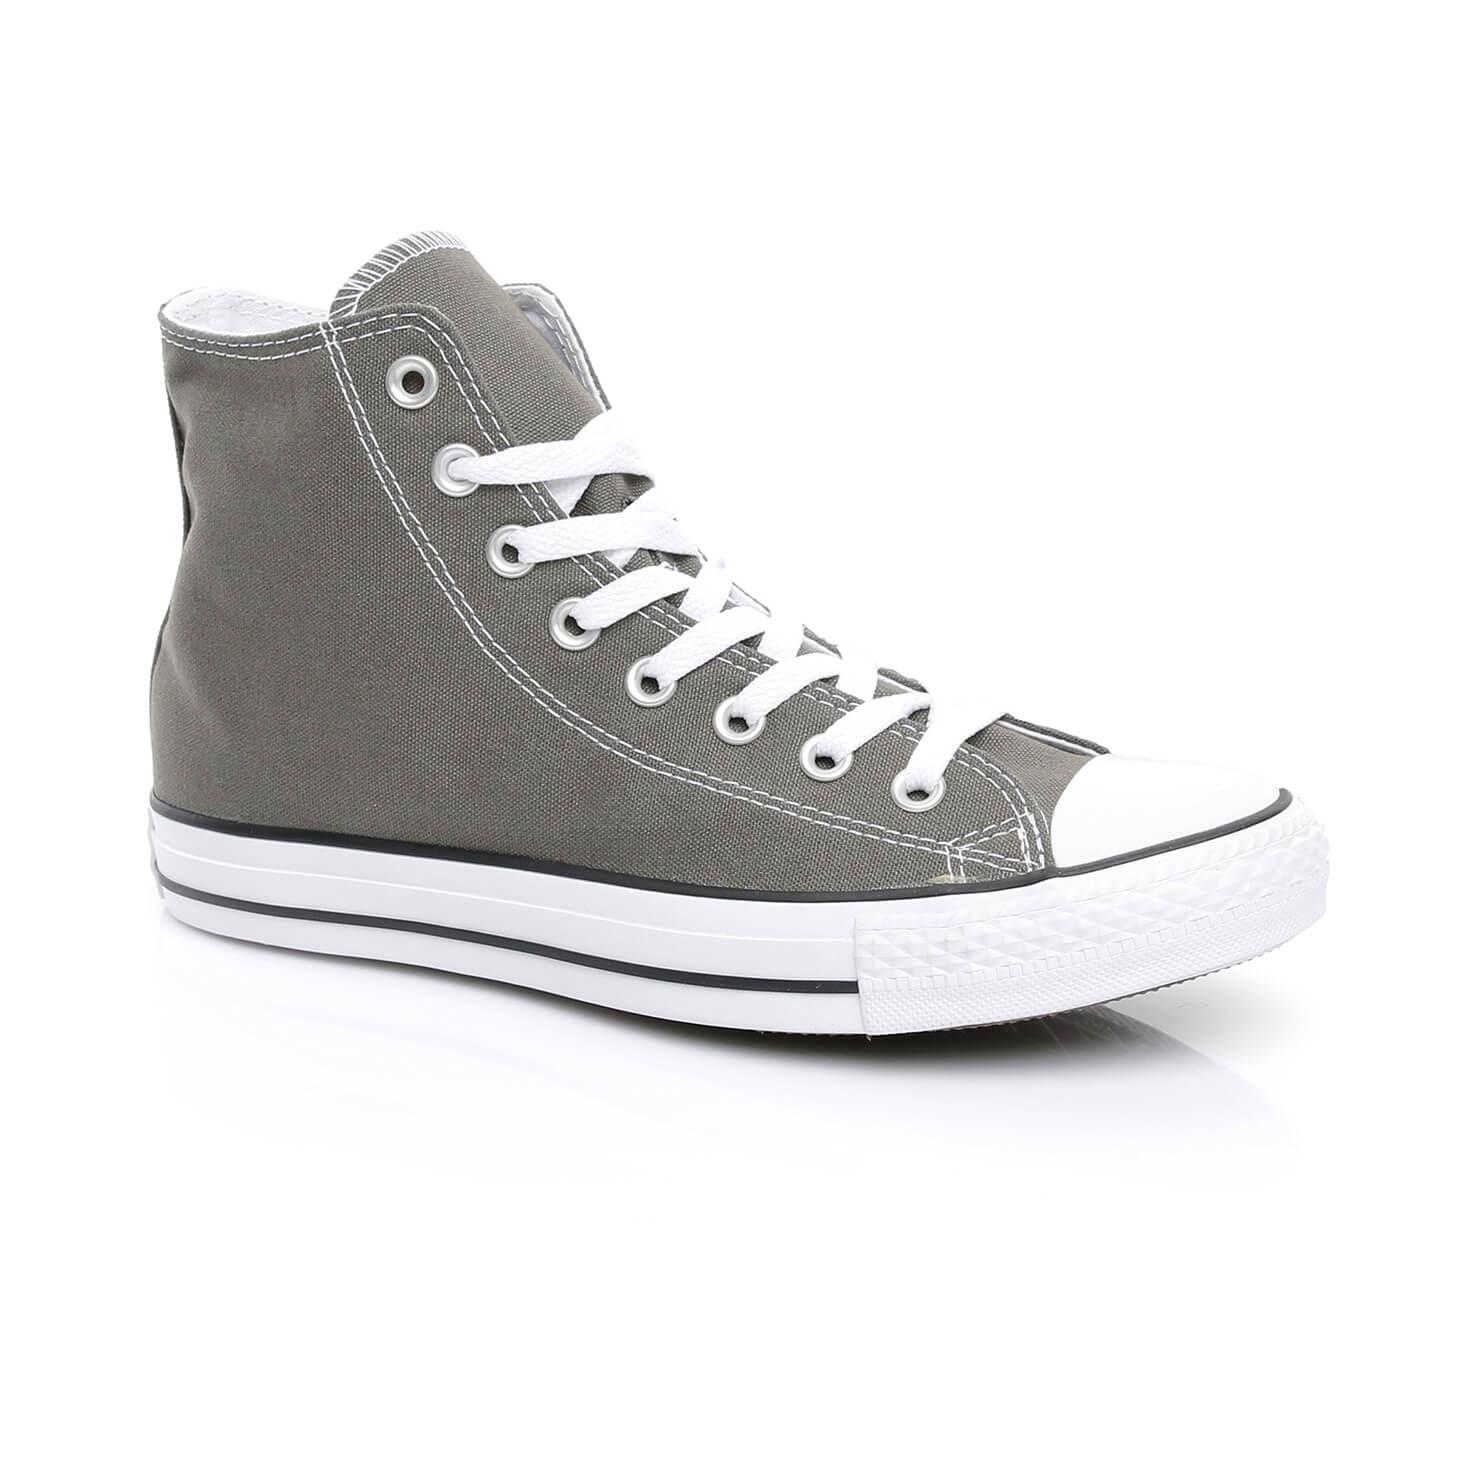 Converse Chuck Taylor All Star Hi Unisex Gri Sneaker